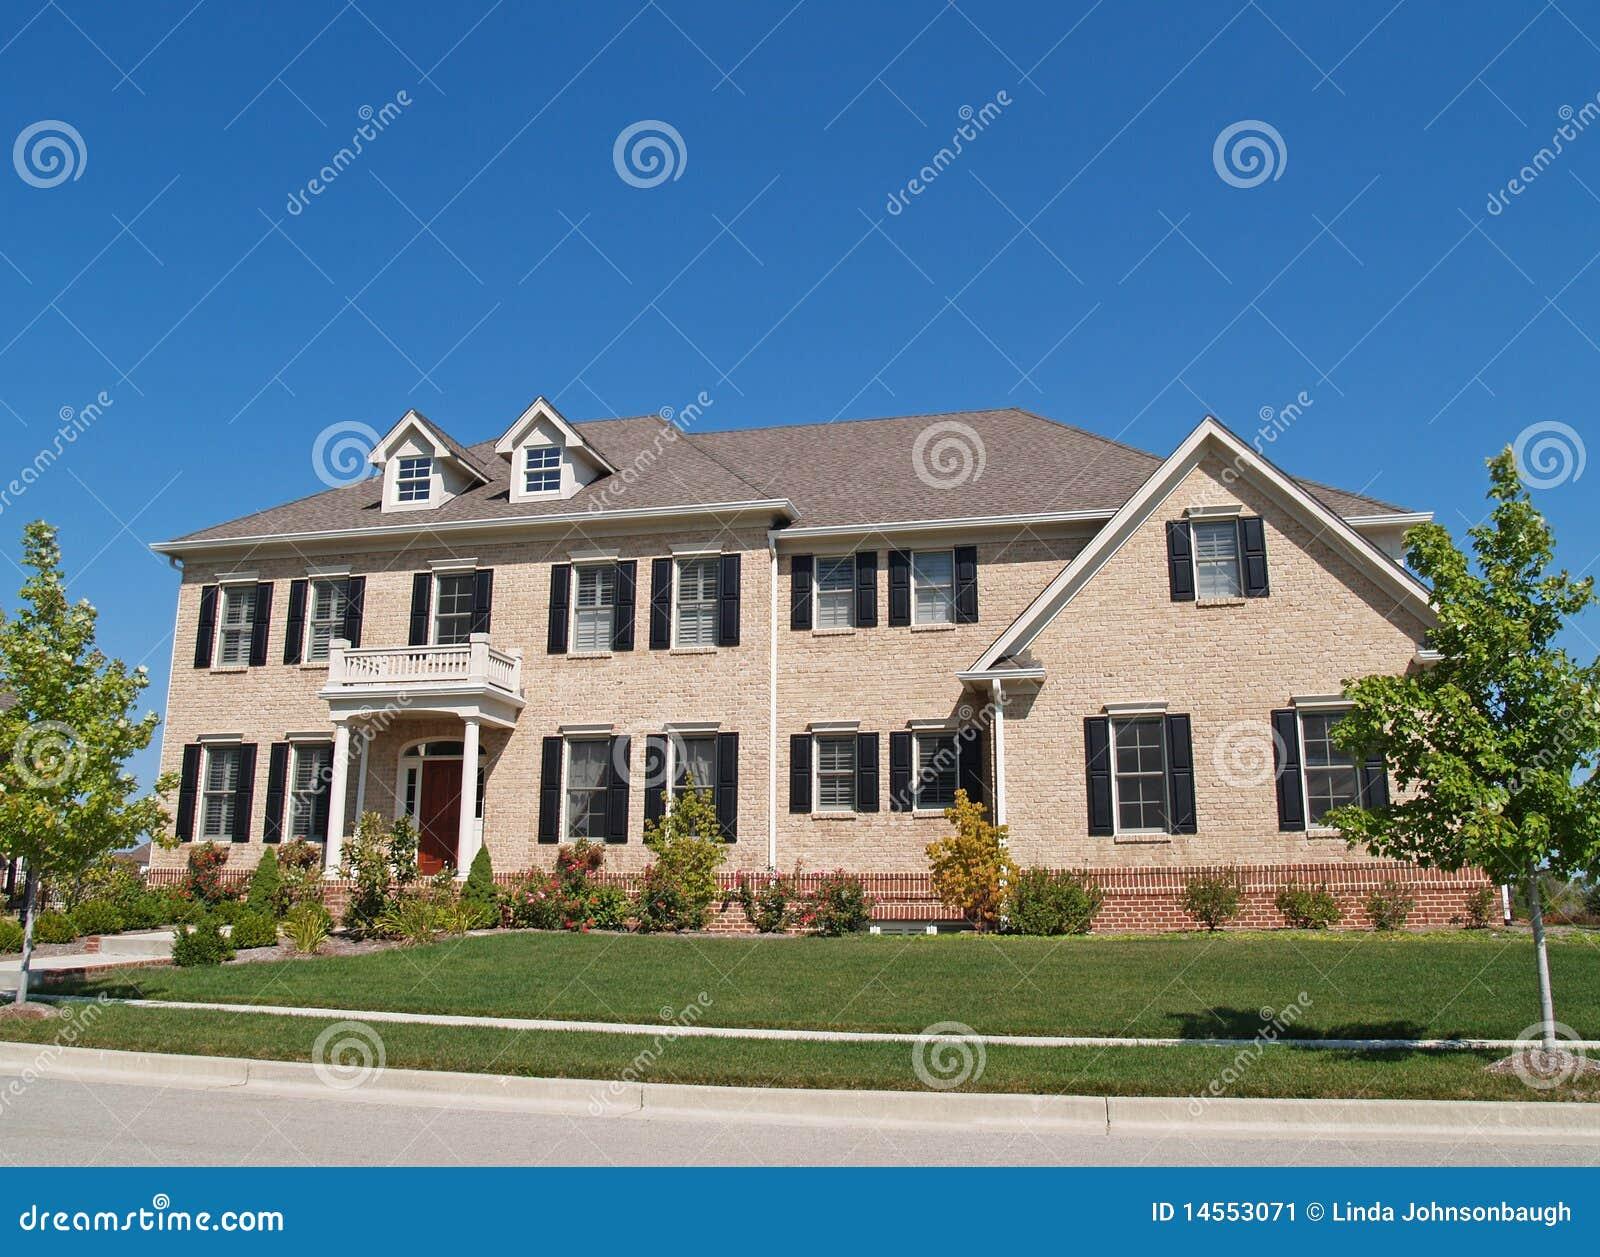 Huge Two Story Brick Home Stock Image Image 14553071